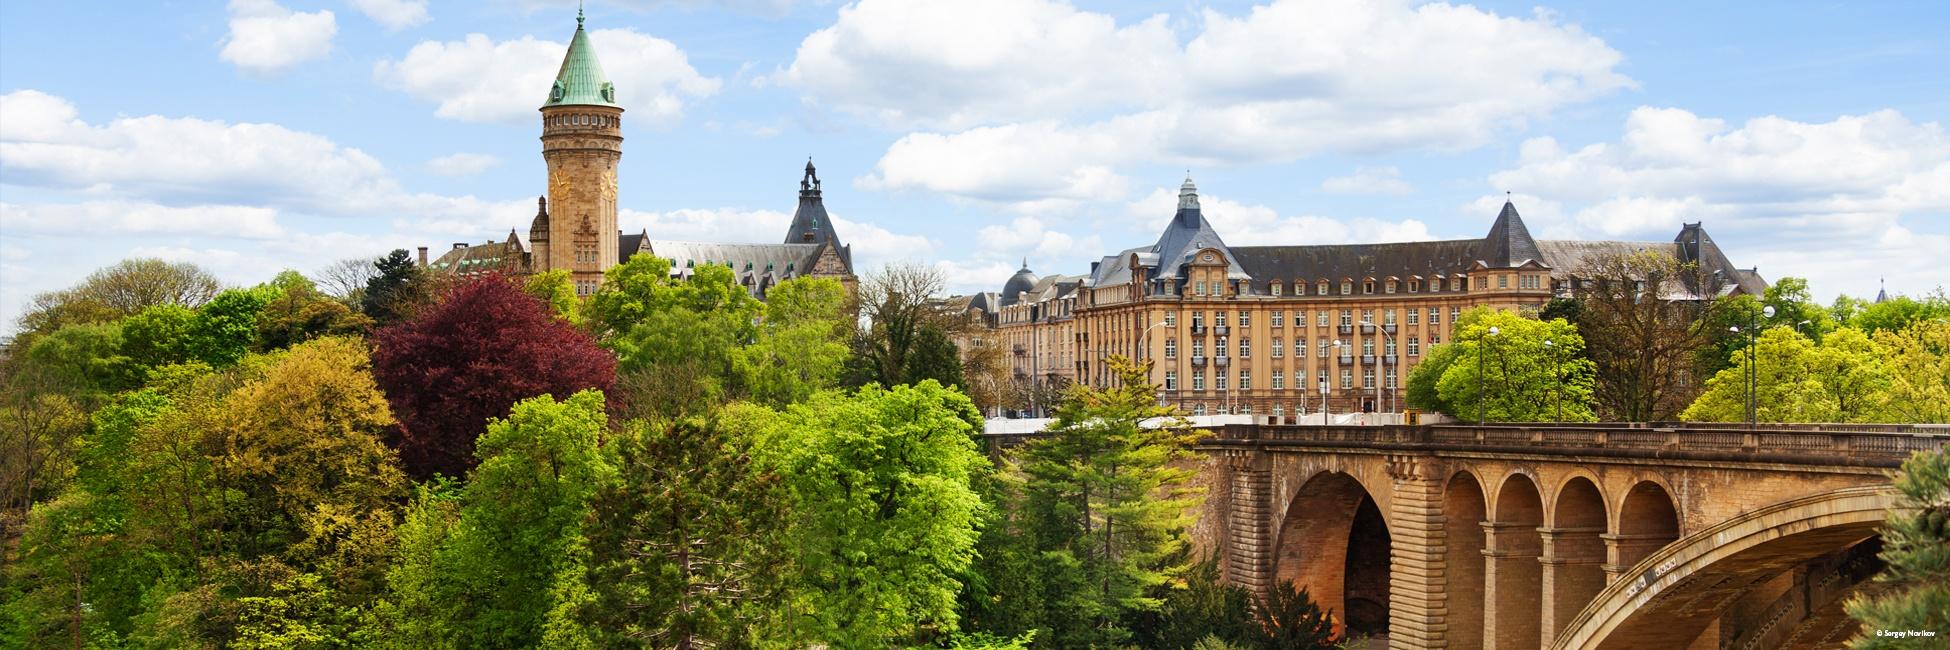 Luxembourg, capitale du Grand-Duché